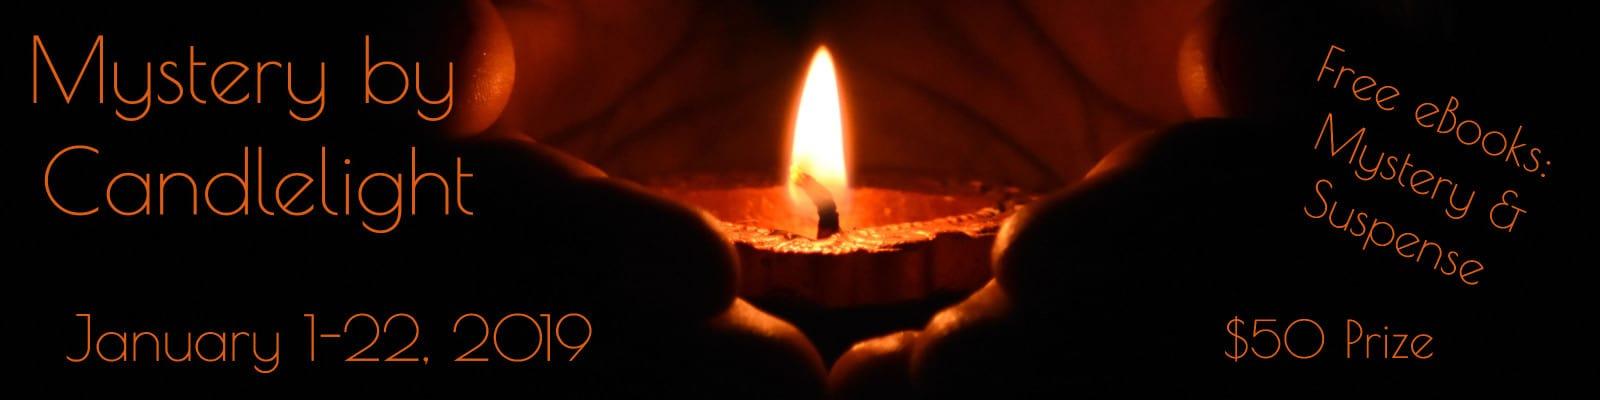 Mystery by Candlelight: Mystery & Suspense eBooks